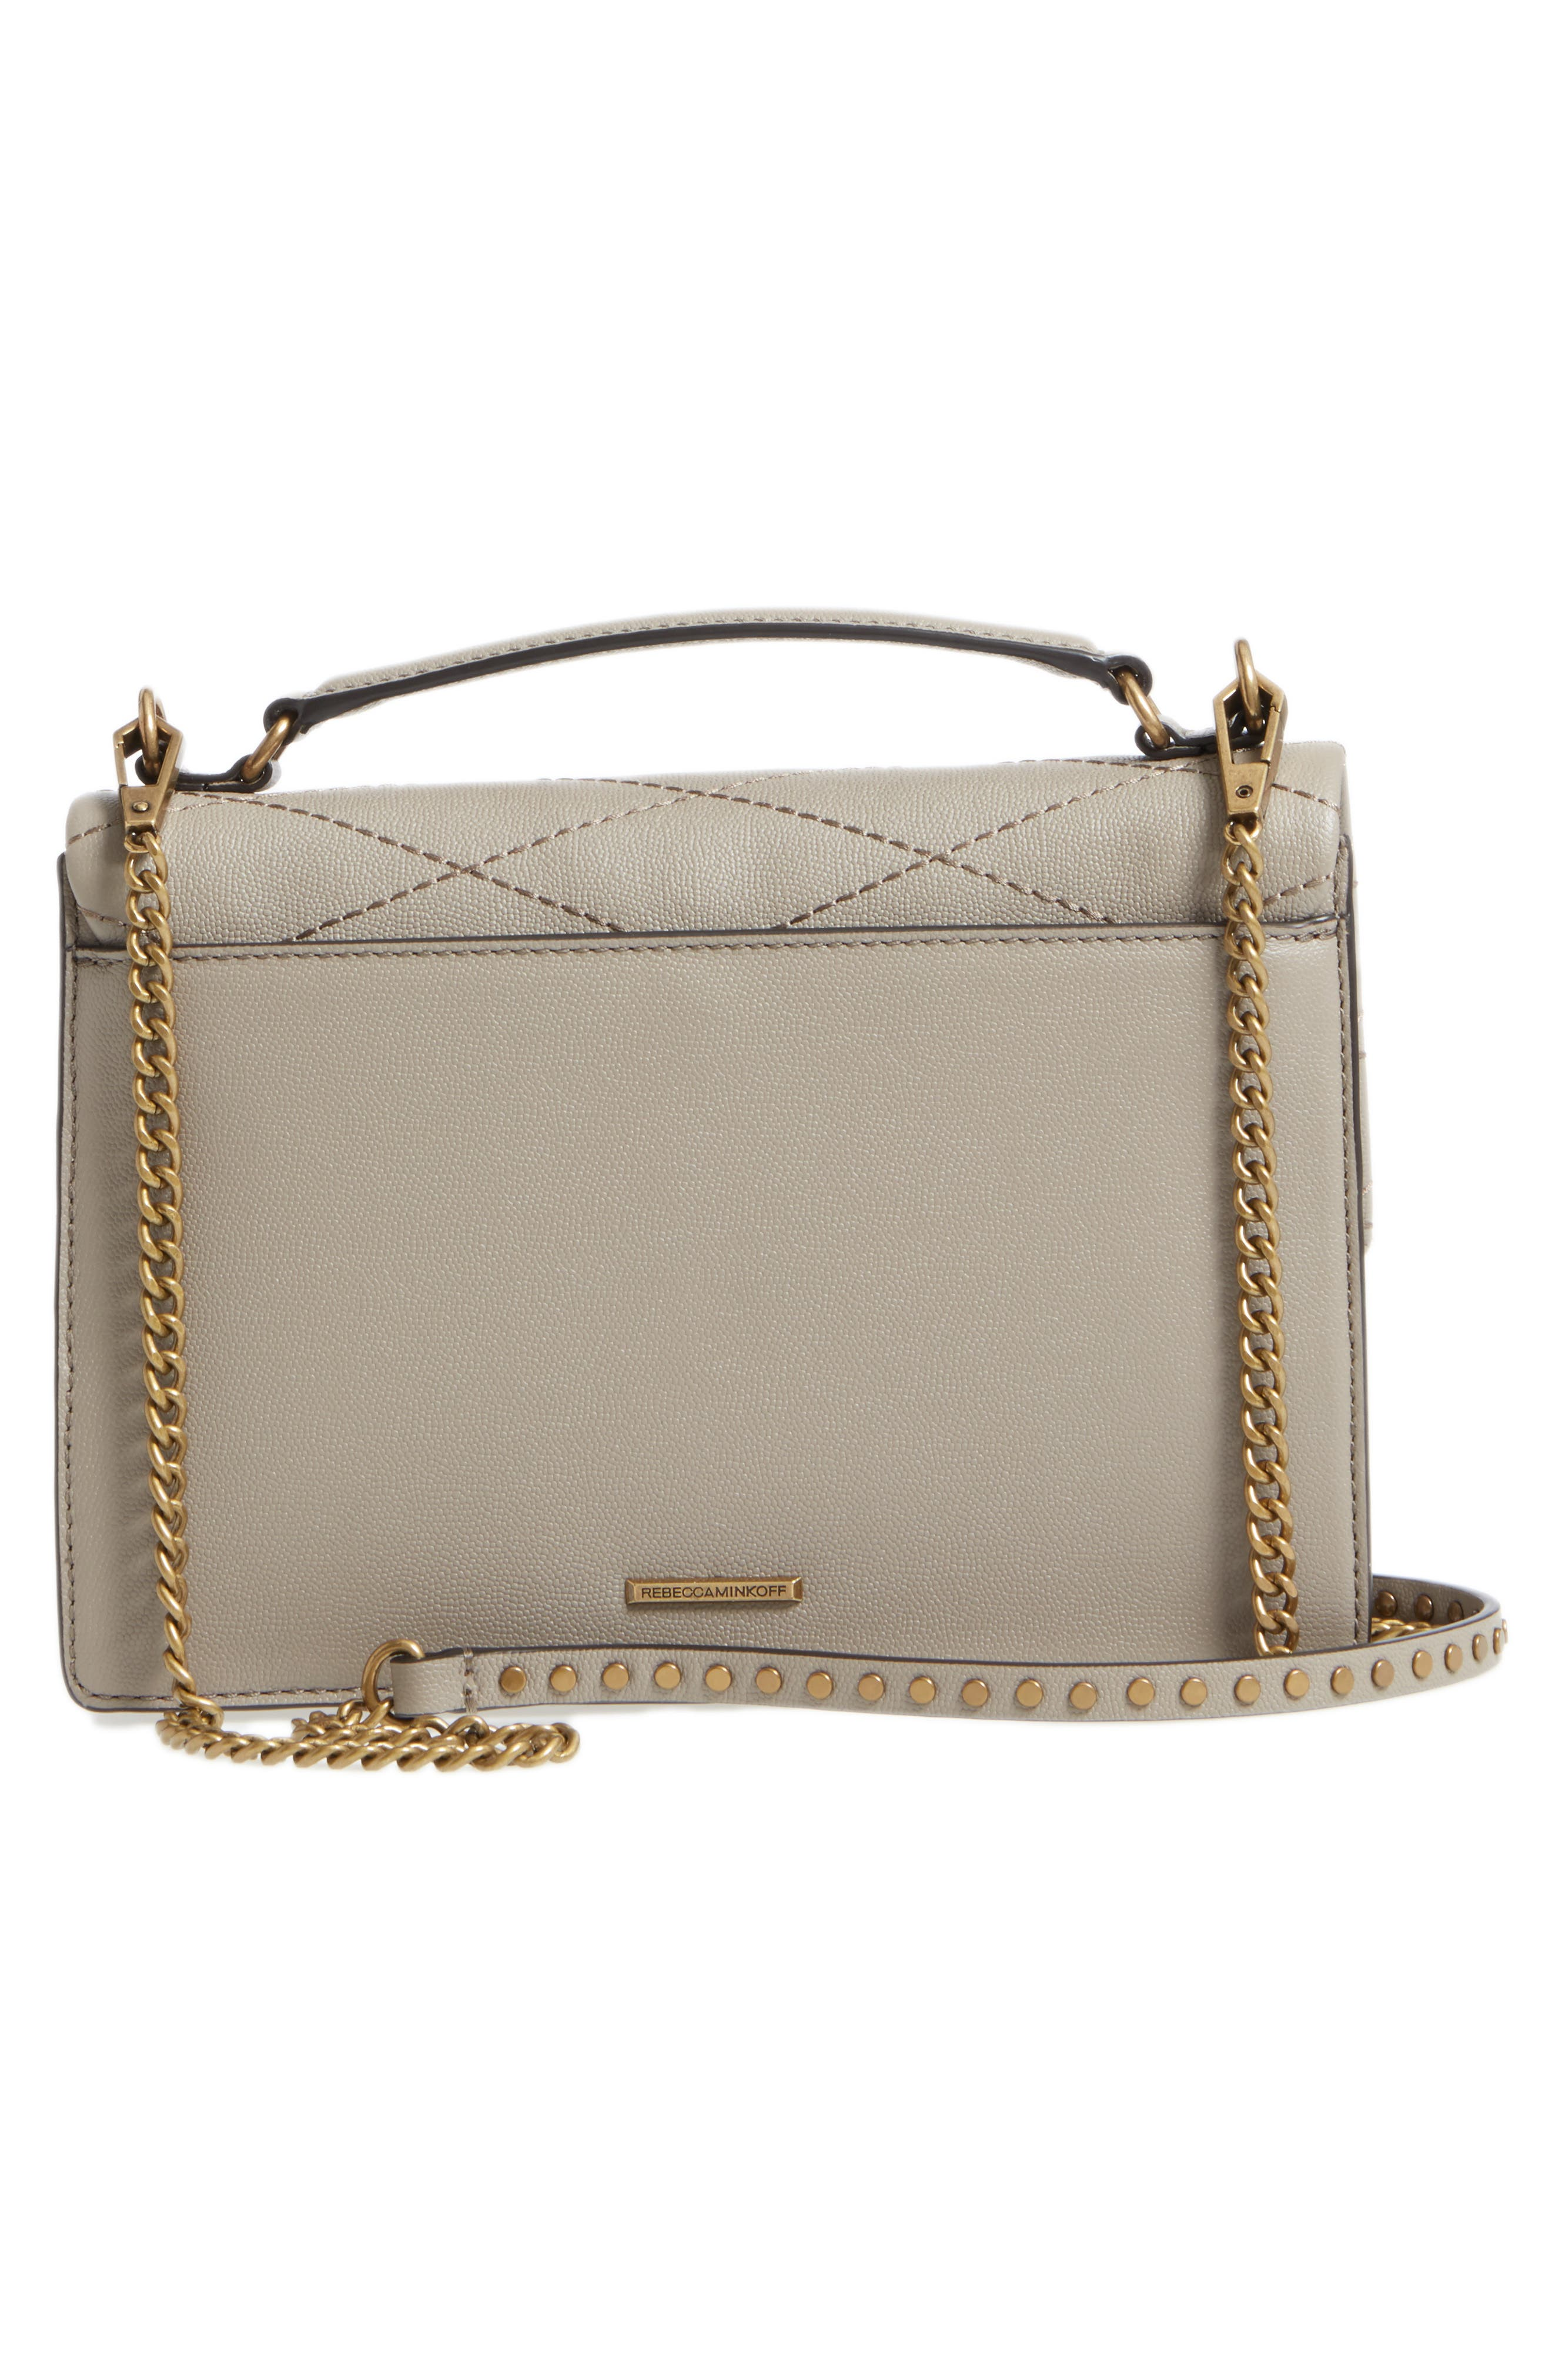 Medium Je T'aime Convertible Leather Crossbody Bag,                             Alternate thumbnail 24, color,